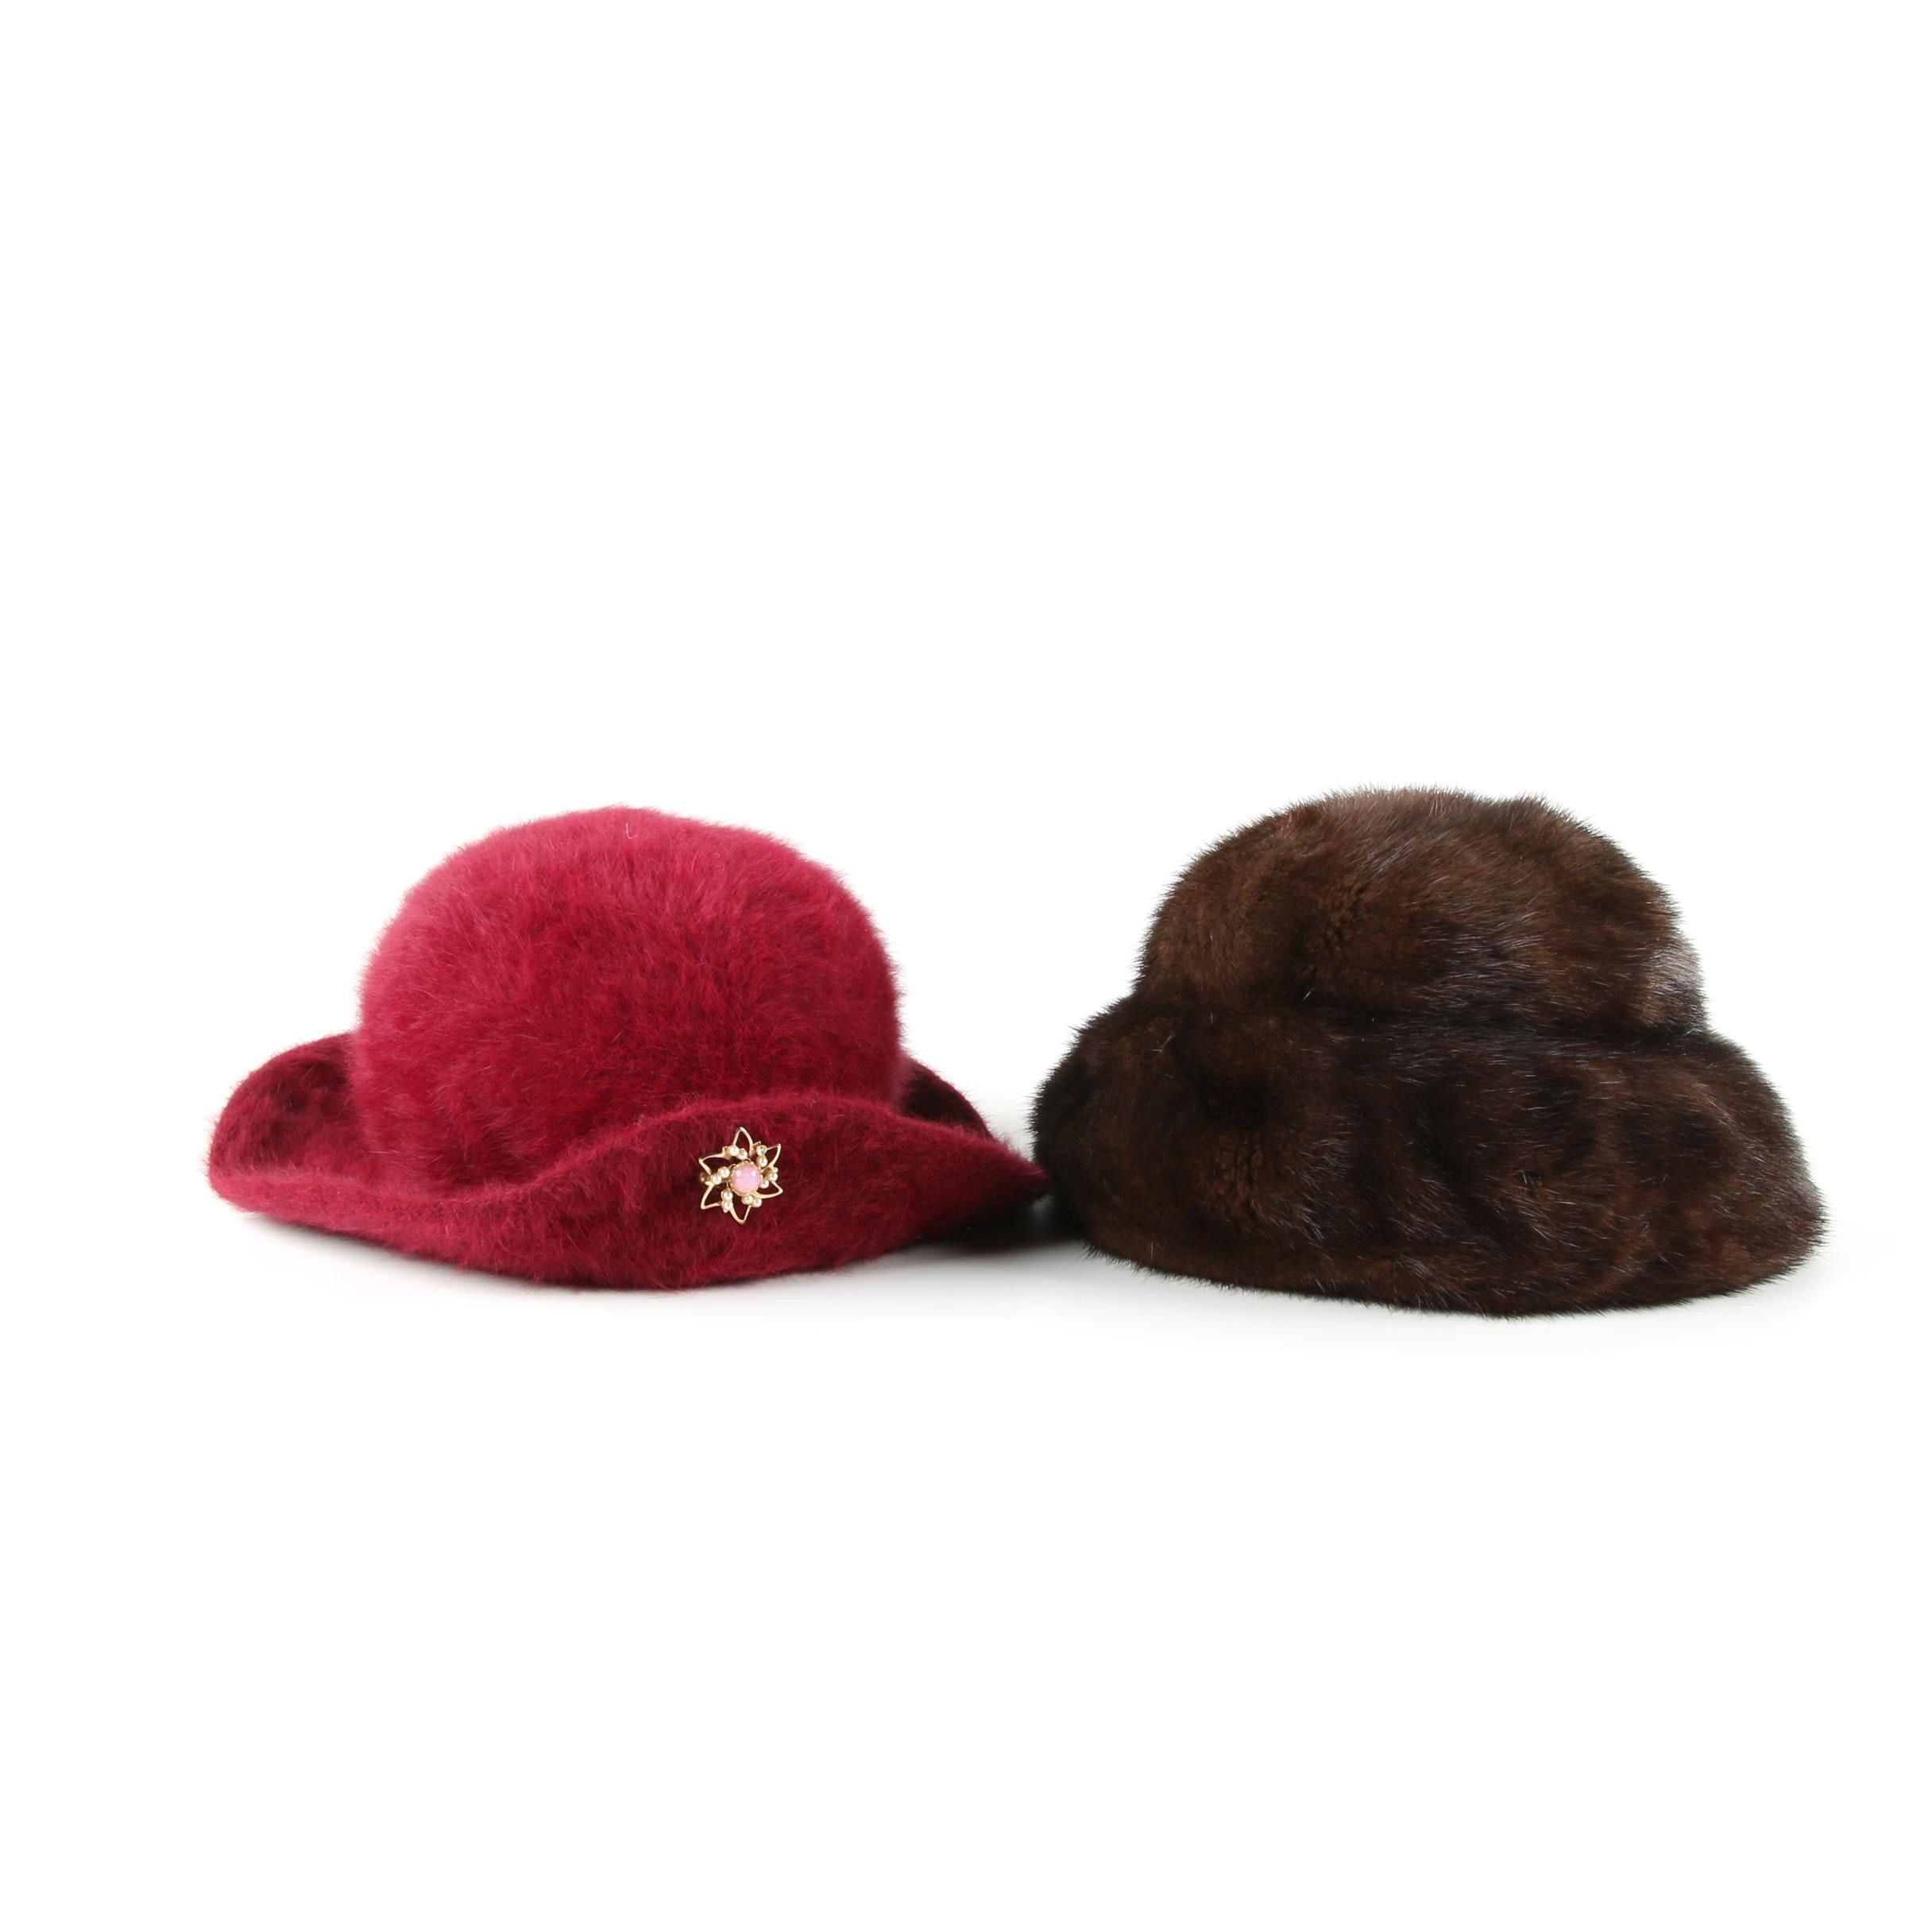 Women's Mink Fur and Halper Brothers Dyed Rabbit Fur Cloche Hats